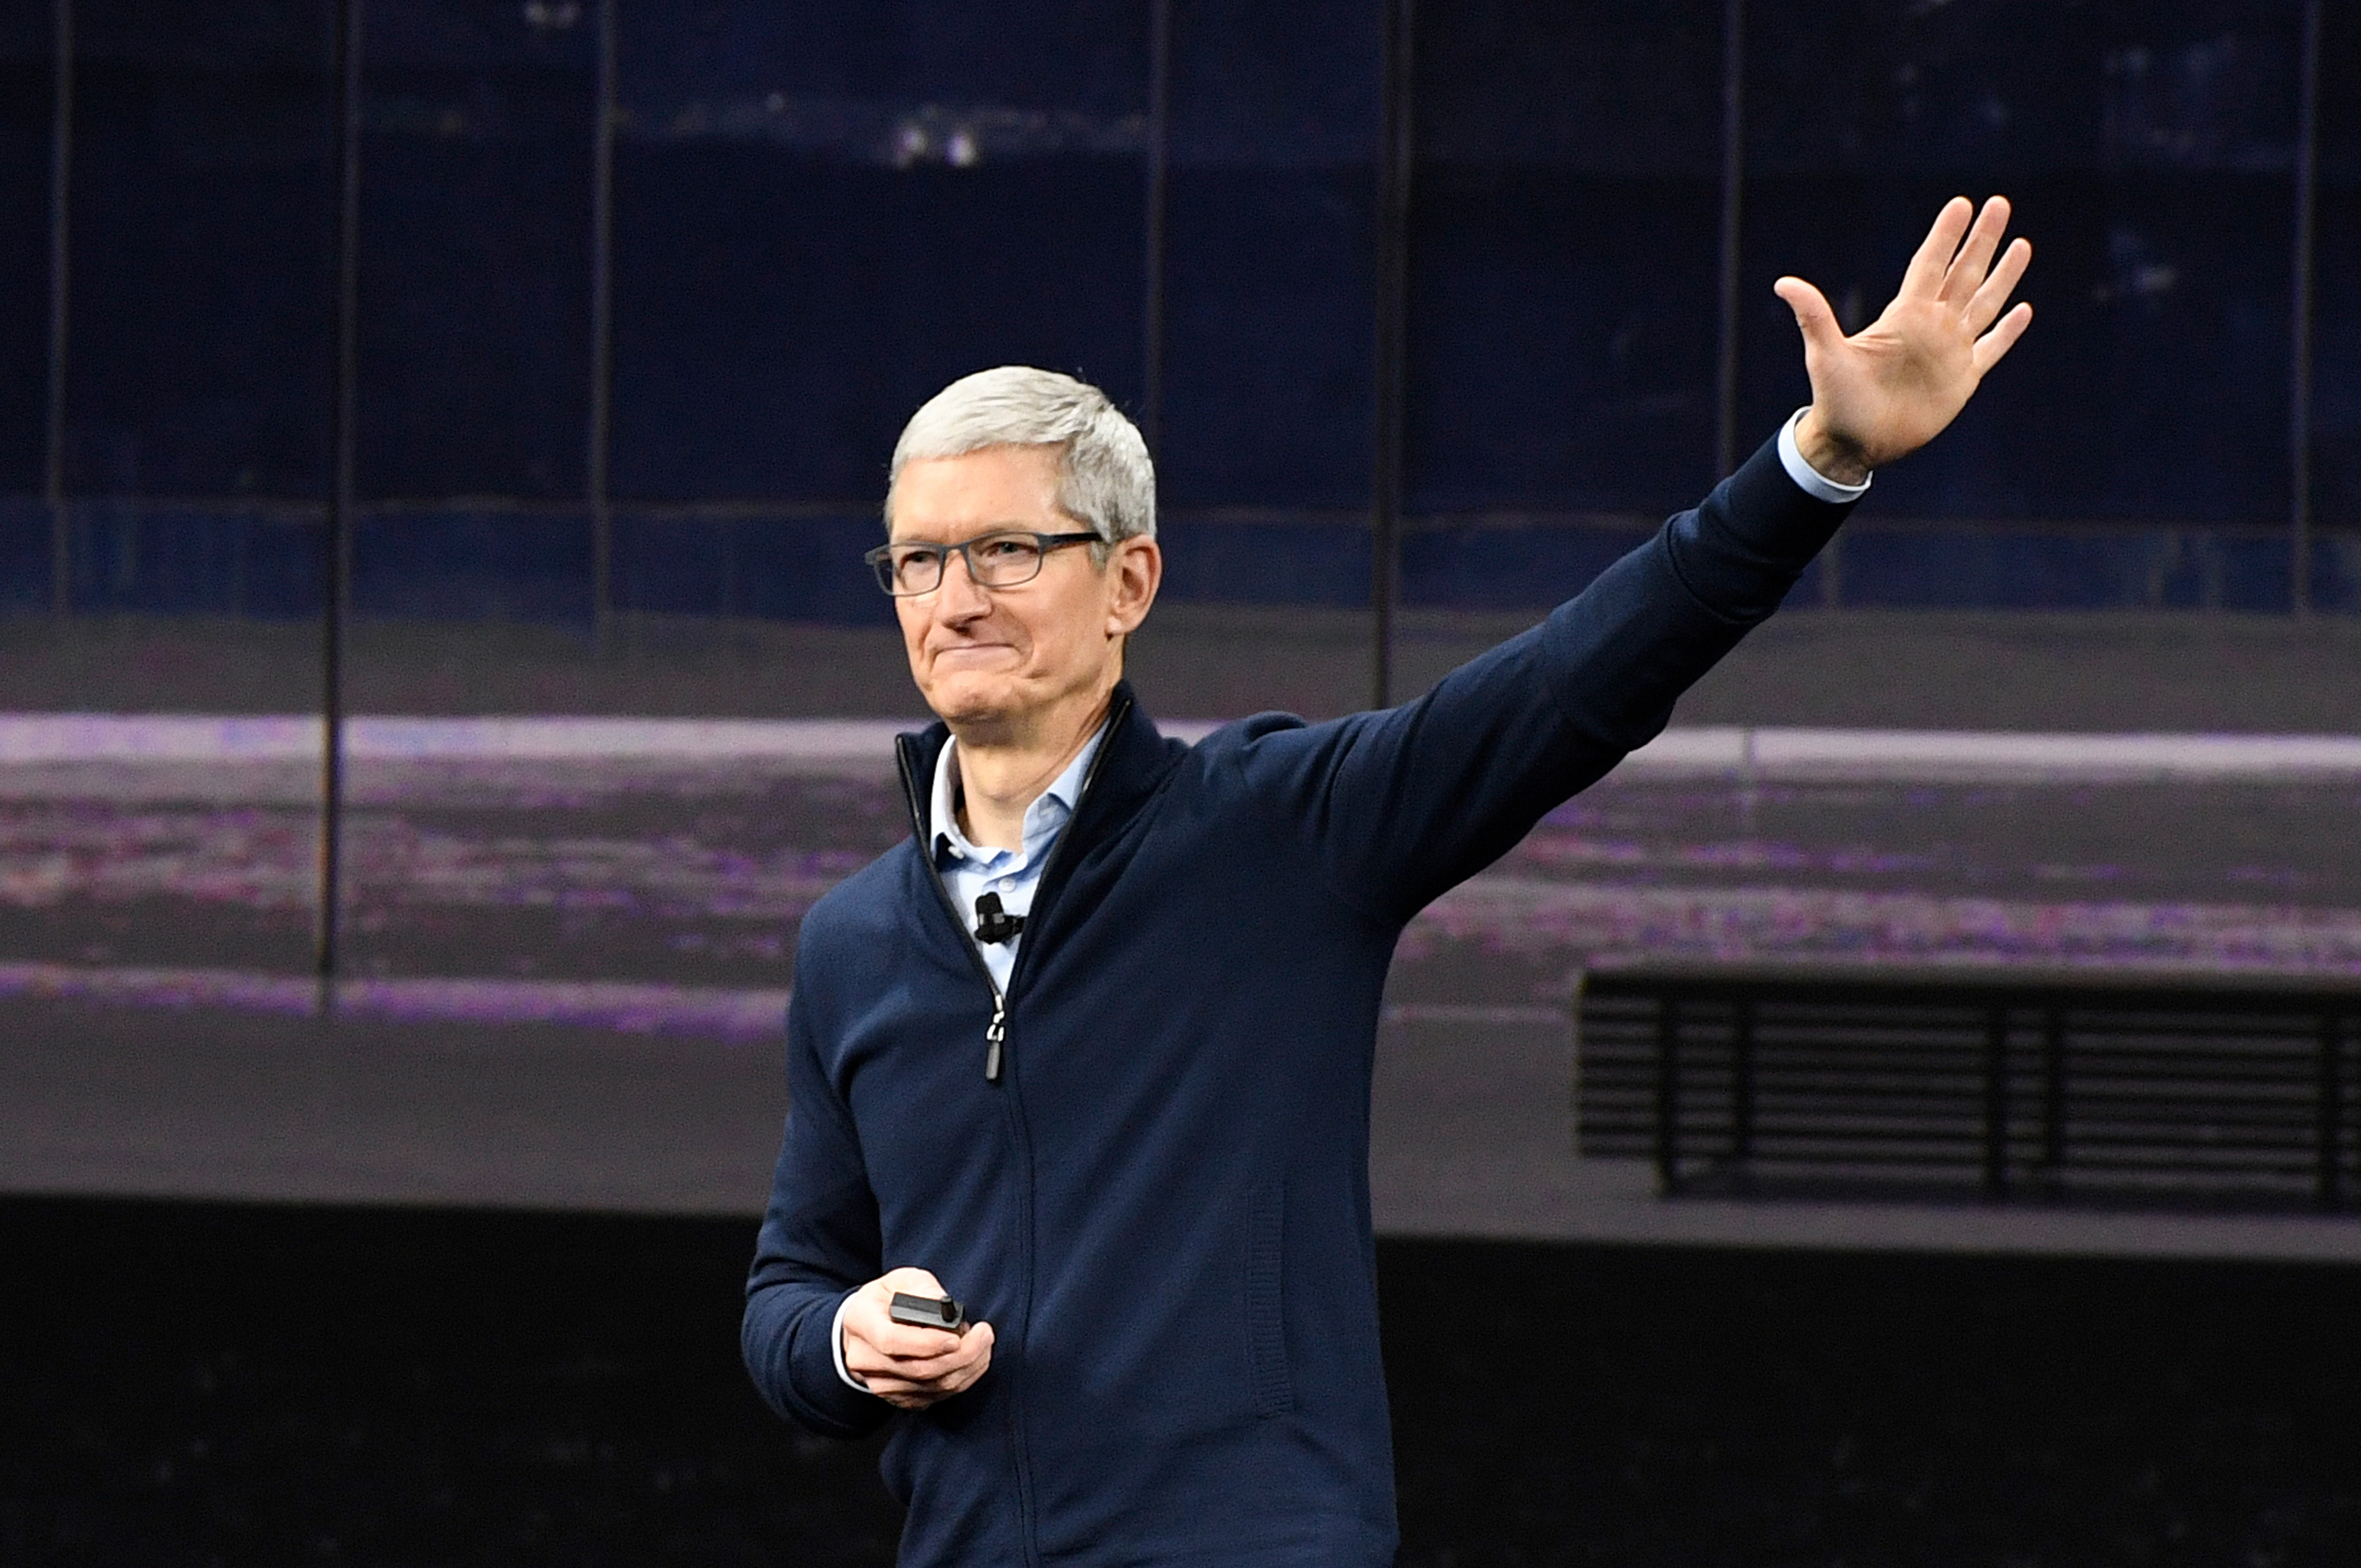 Apple Q1 2020 Results - $91.8 Billion Revenue